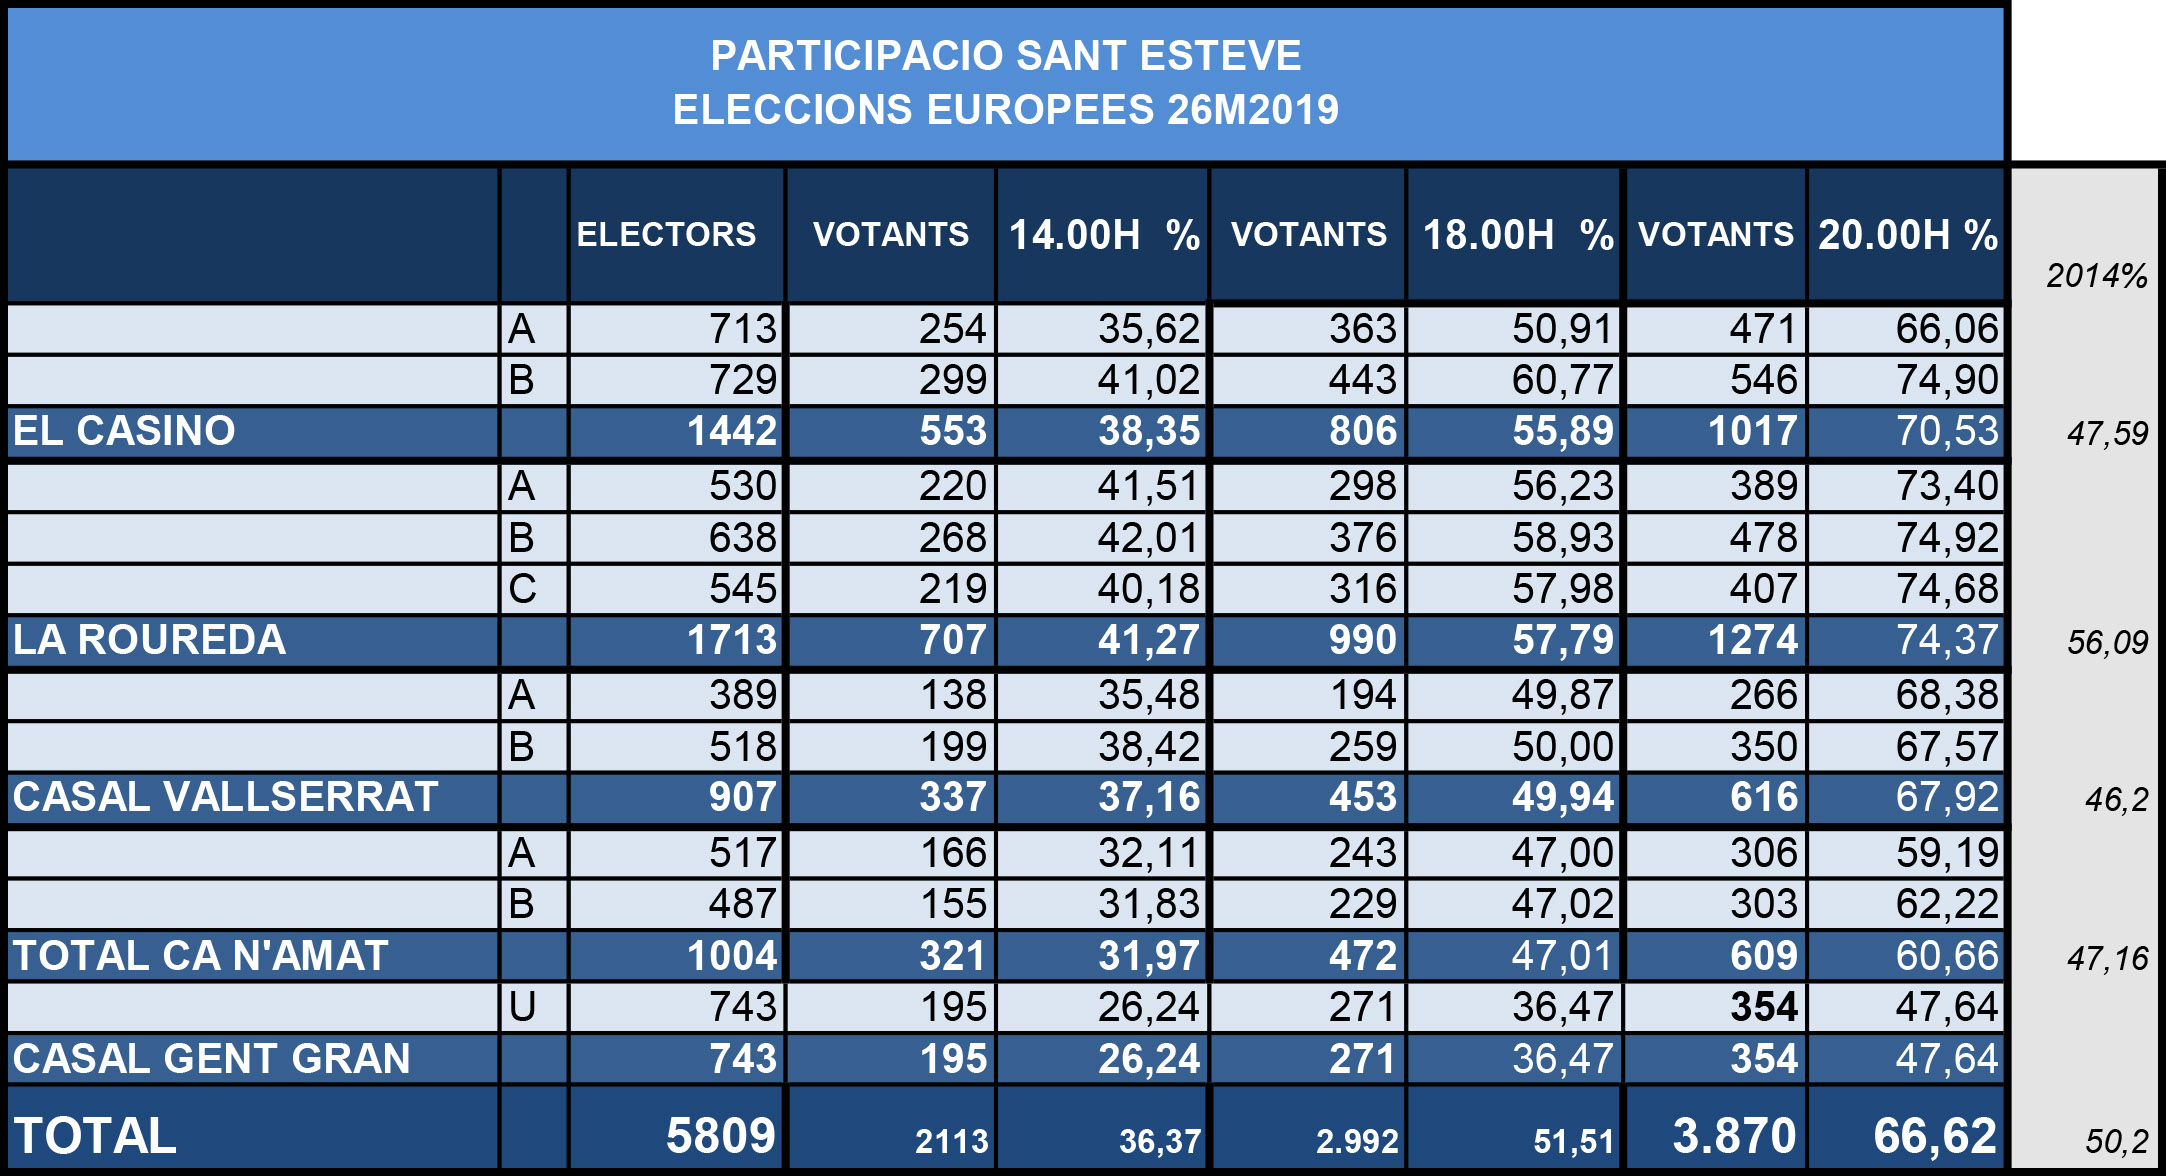 Participació europees 2019